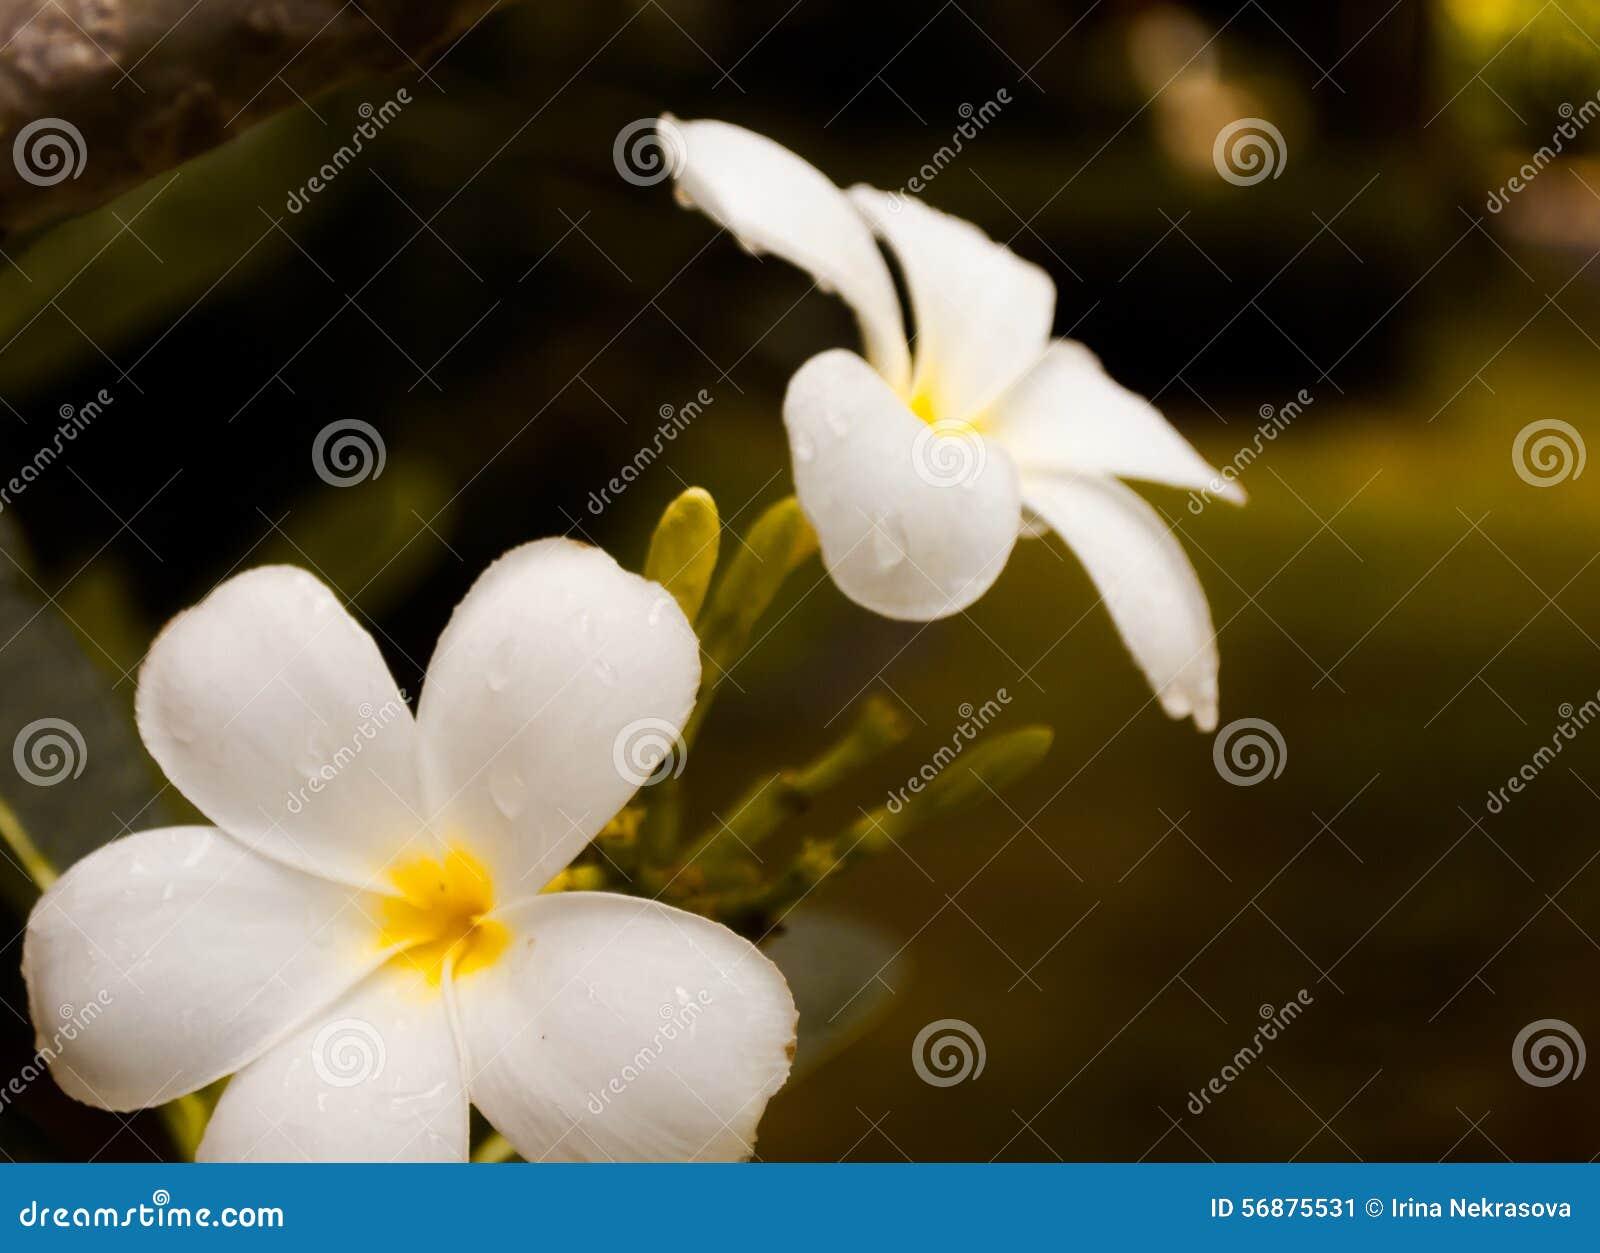 White flowers plumeria with rain drop